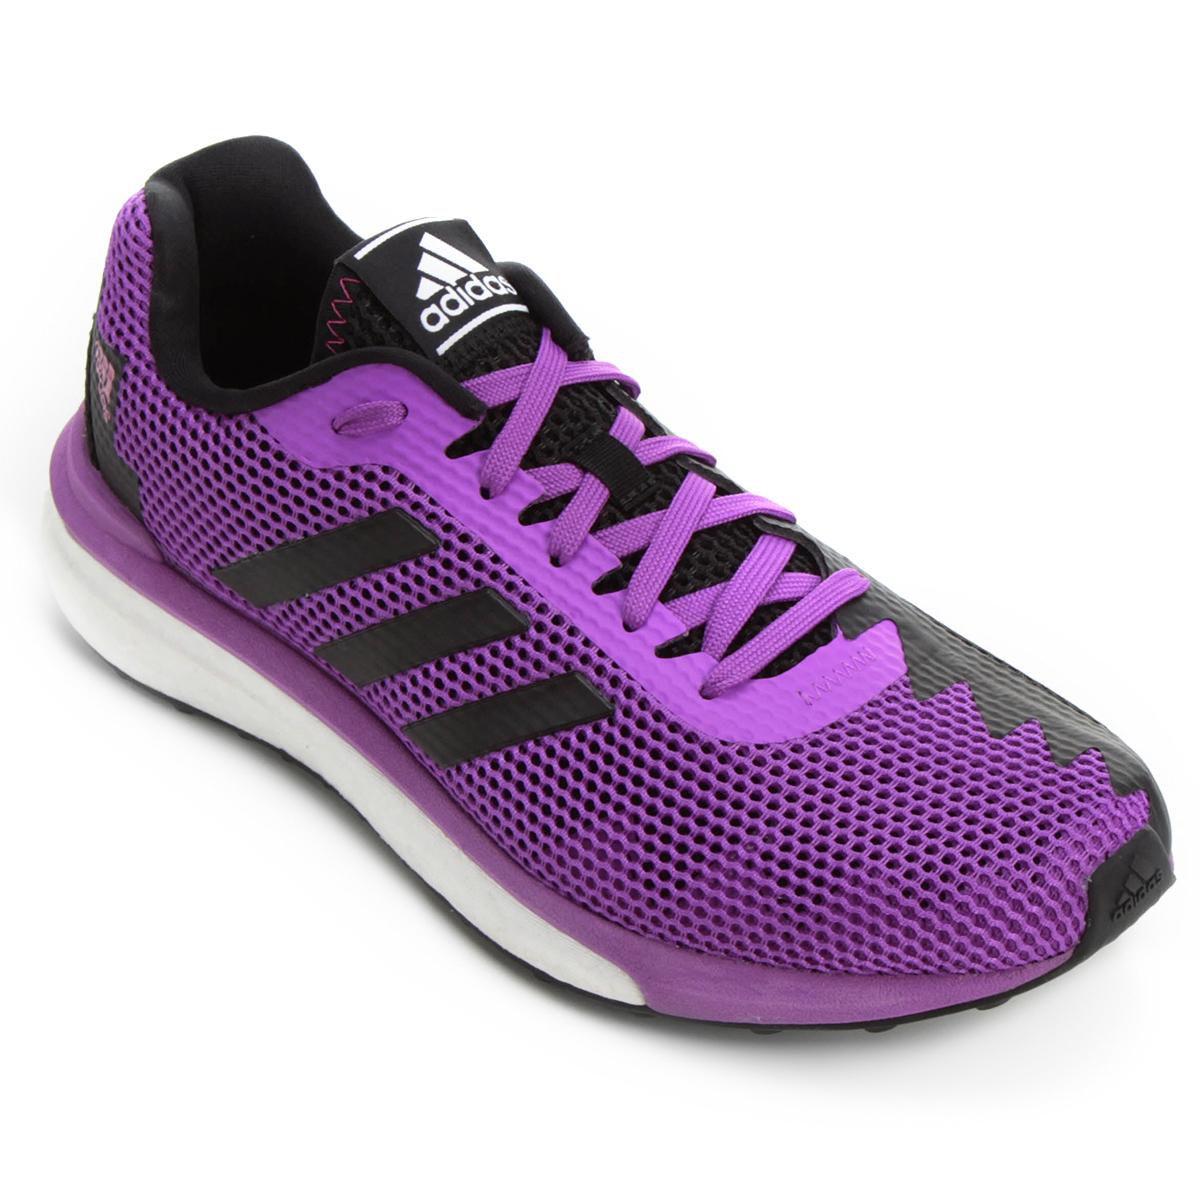 Tênis Feminino Adidas Vengeful w Tecnologia Boost - BRACIA SHOP ... 62790aeb61dd4